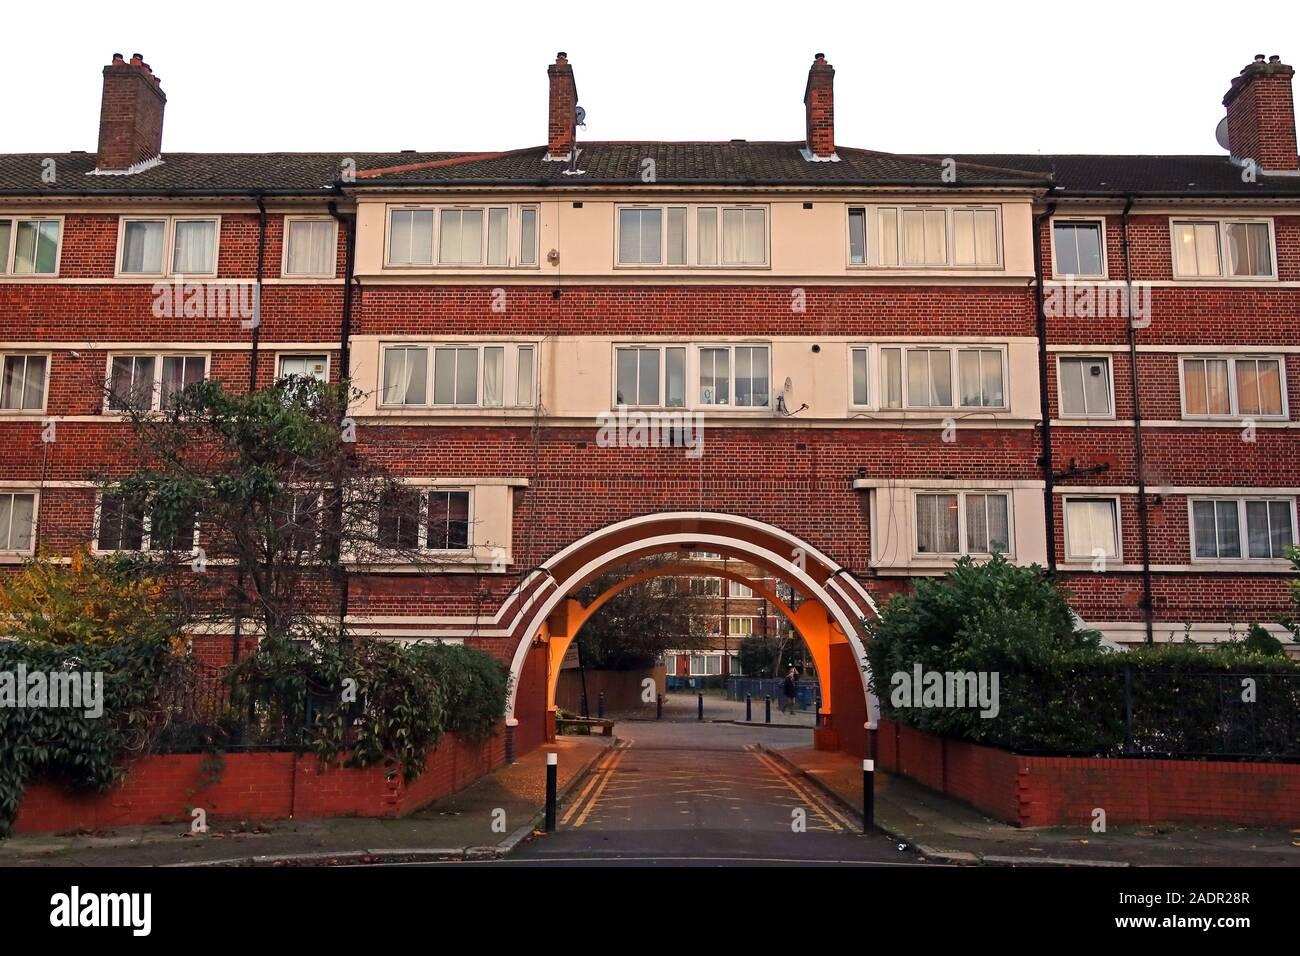 GoTonySmith,HotpixUK,@HotpixUK,South London,England,UK,UKhousing,UK Housing,flats,block,arch,arnold estate bermondsey